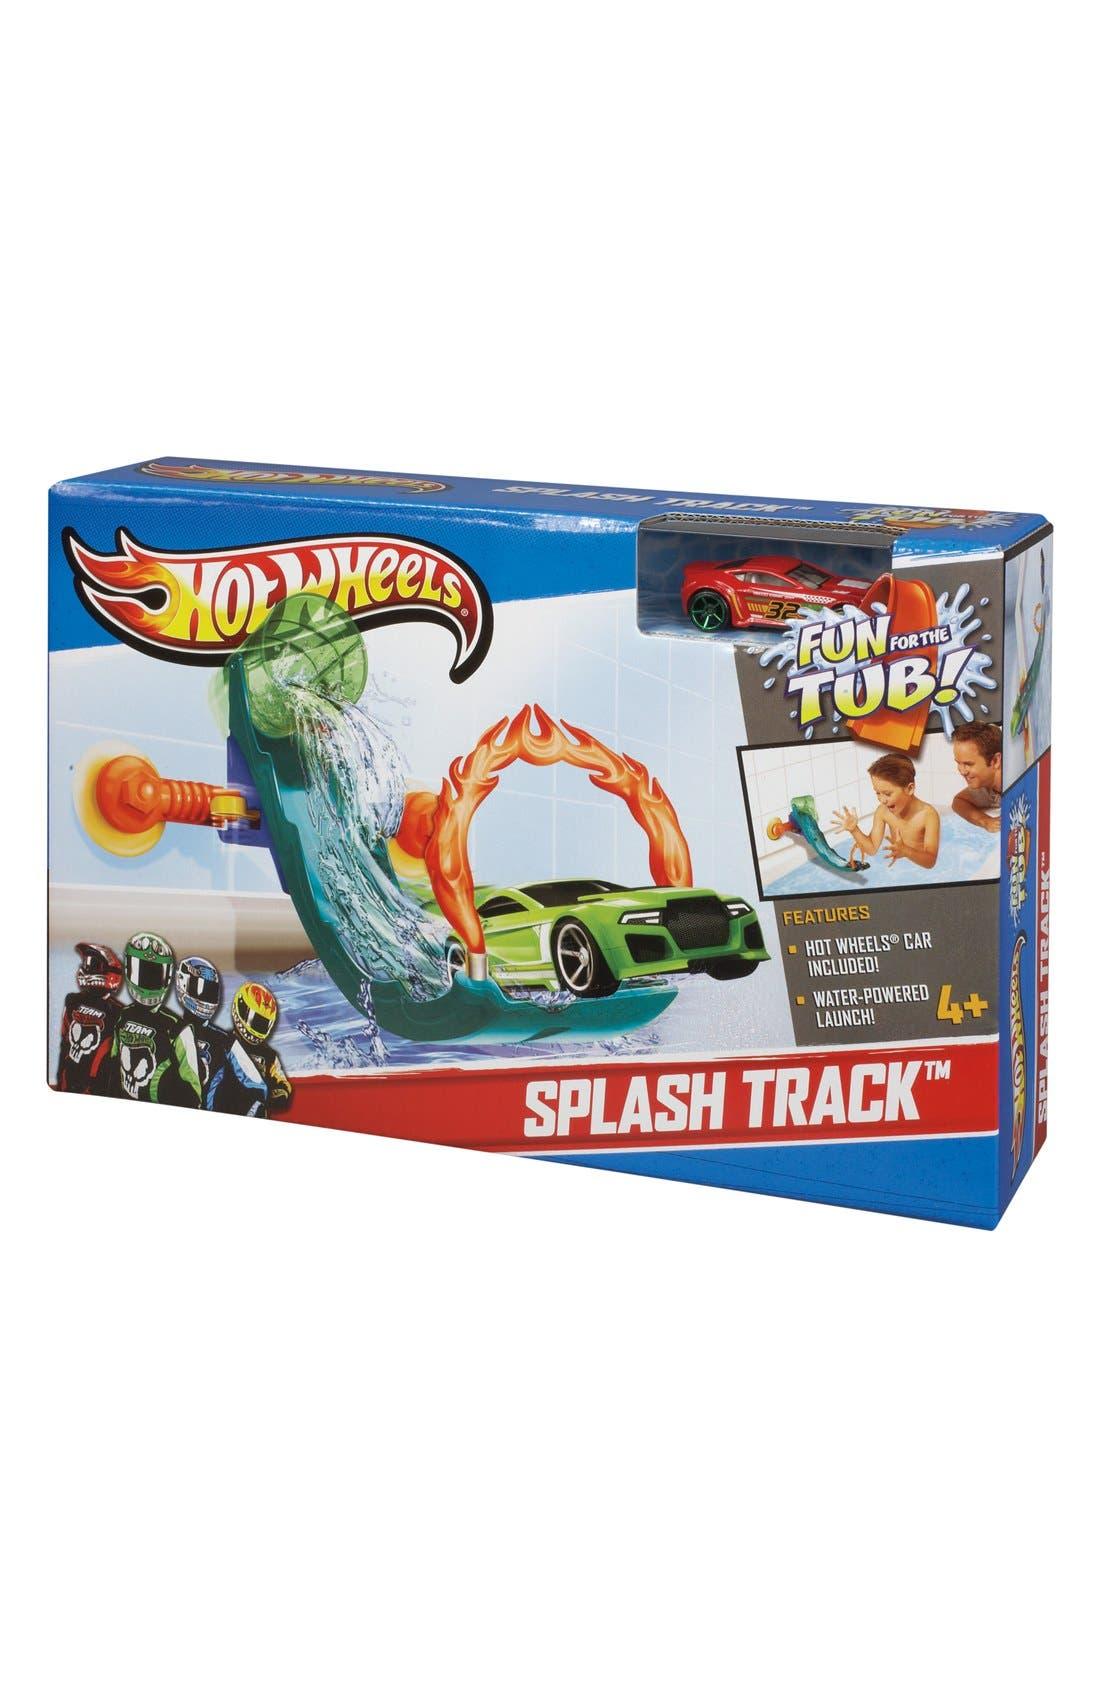 MATTEL,                             'Hot Wheels<sup>®</sup> - Splash Track<sup>™</sup>' Tub Track Set,                             Main thumbnail 1, color,                             400